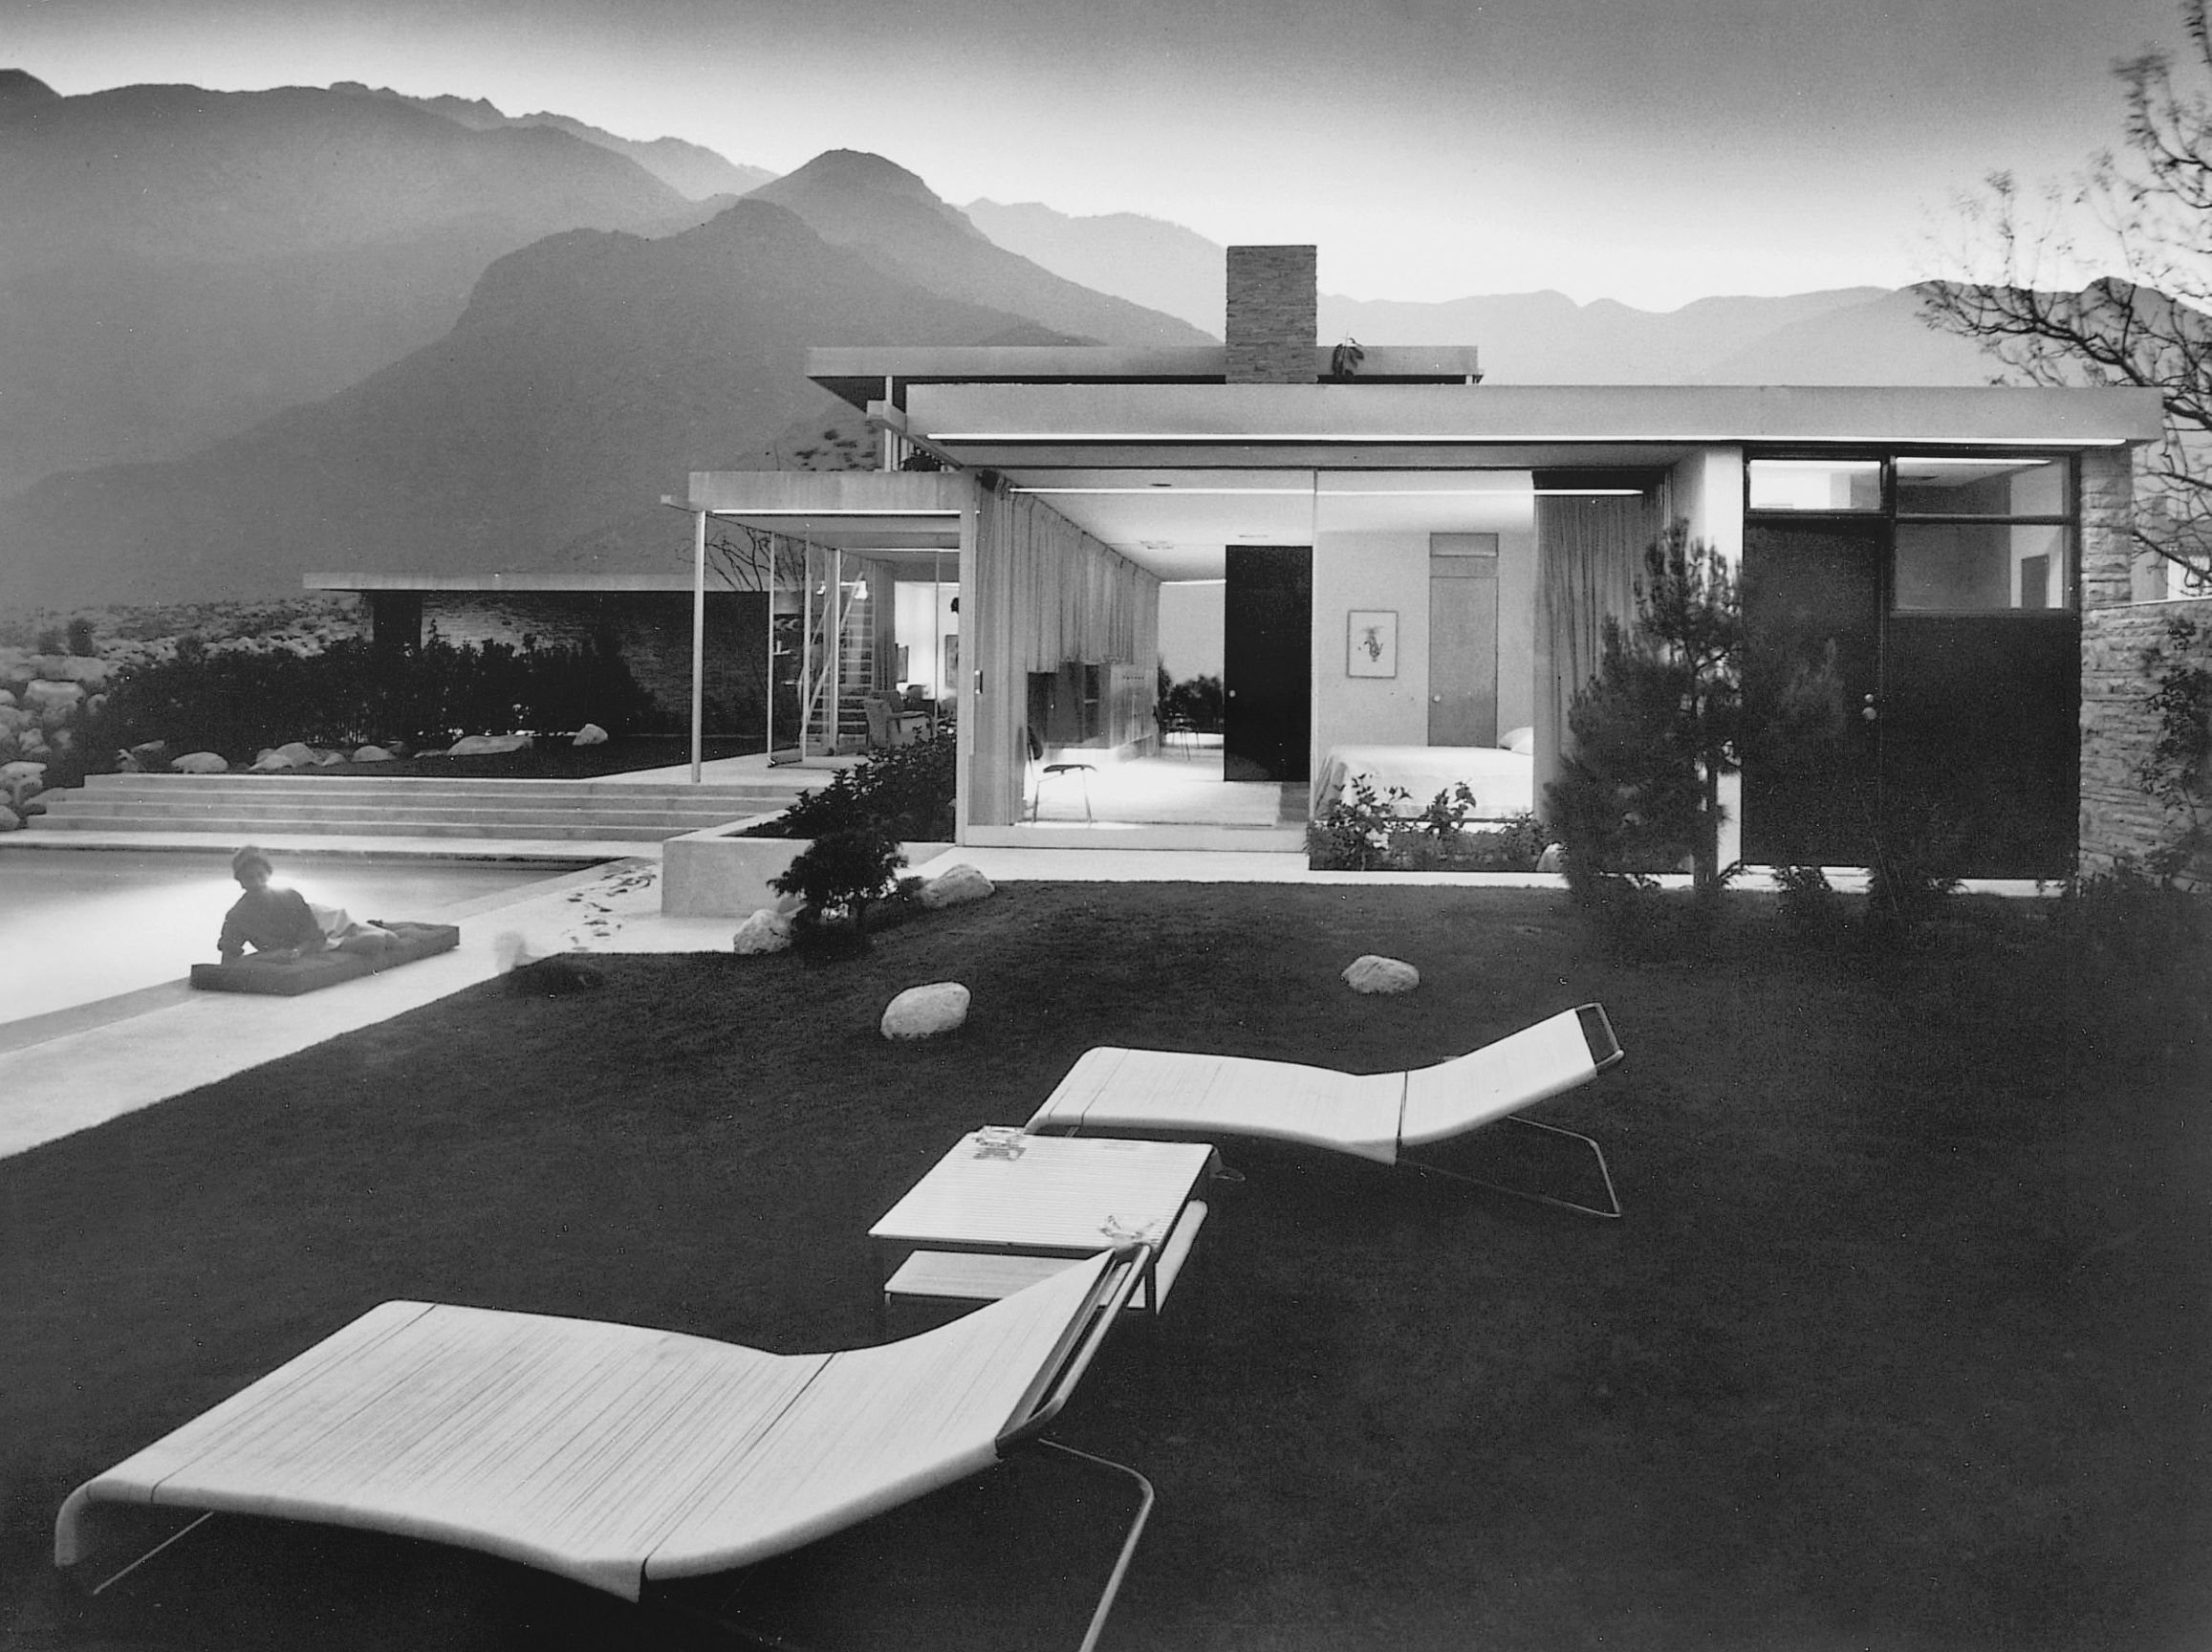 Kaufmann House, Richard Neutra, Palm Springs, California (US), 1947. Photo by Julius Shulman / © J. Paul Getty Trust